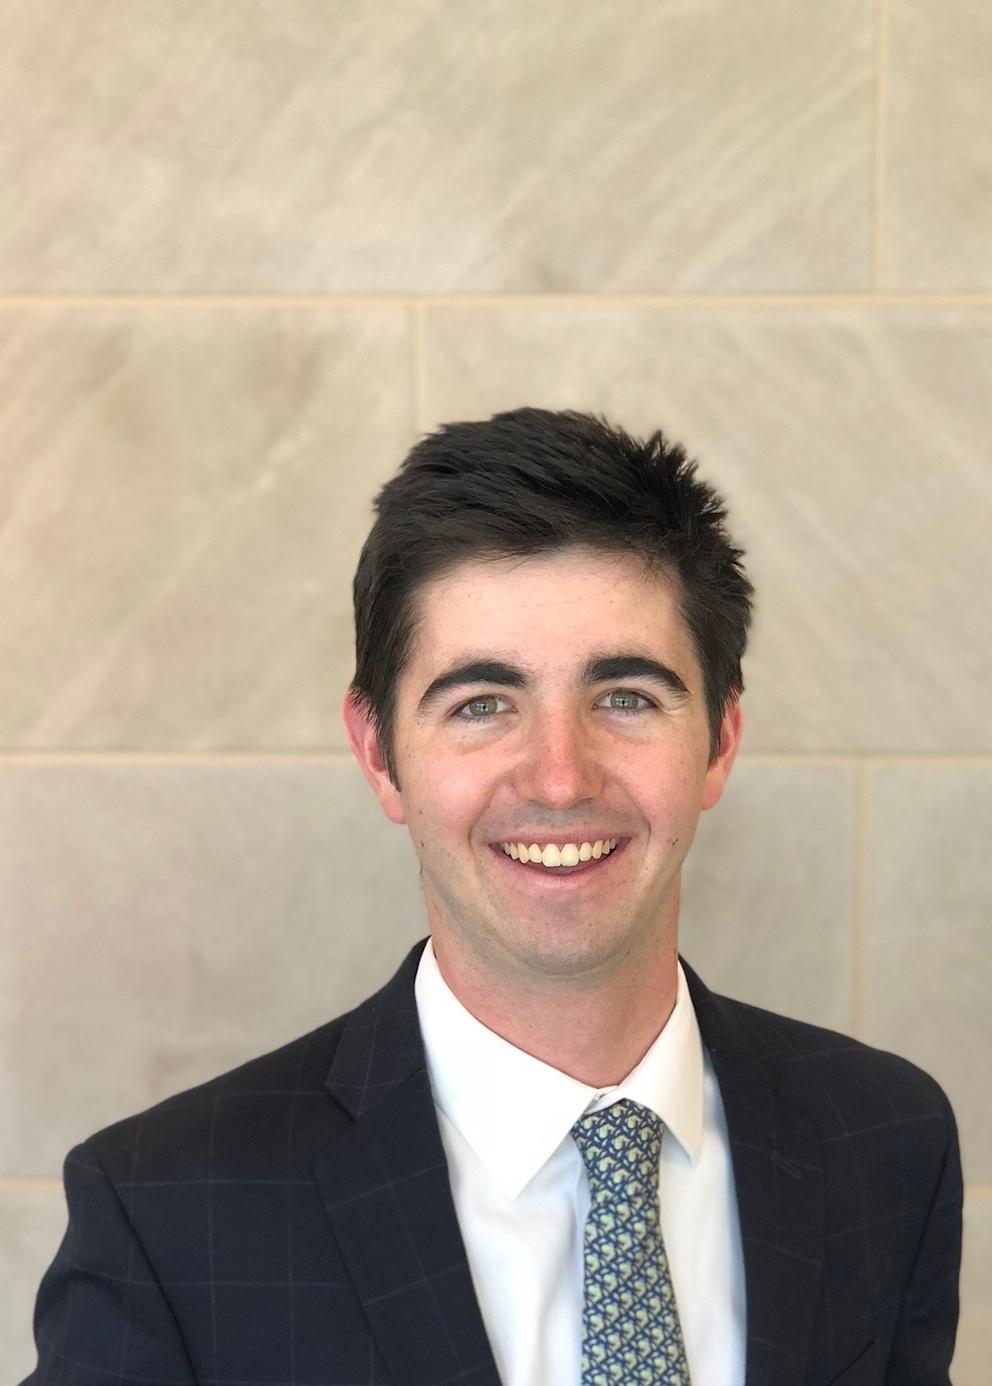 Timothy Bergin '21   Co-President  Bethesda, MD   Trb98@cornell.edu